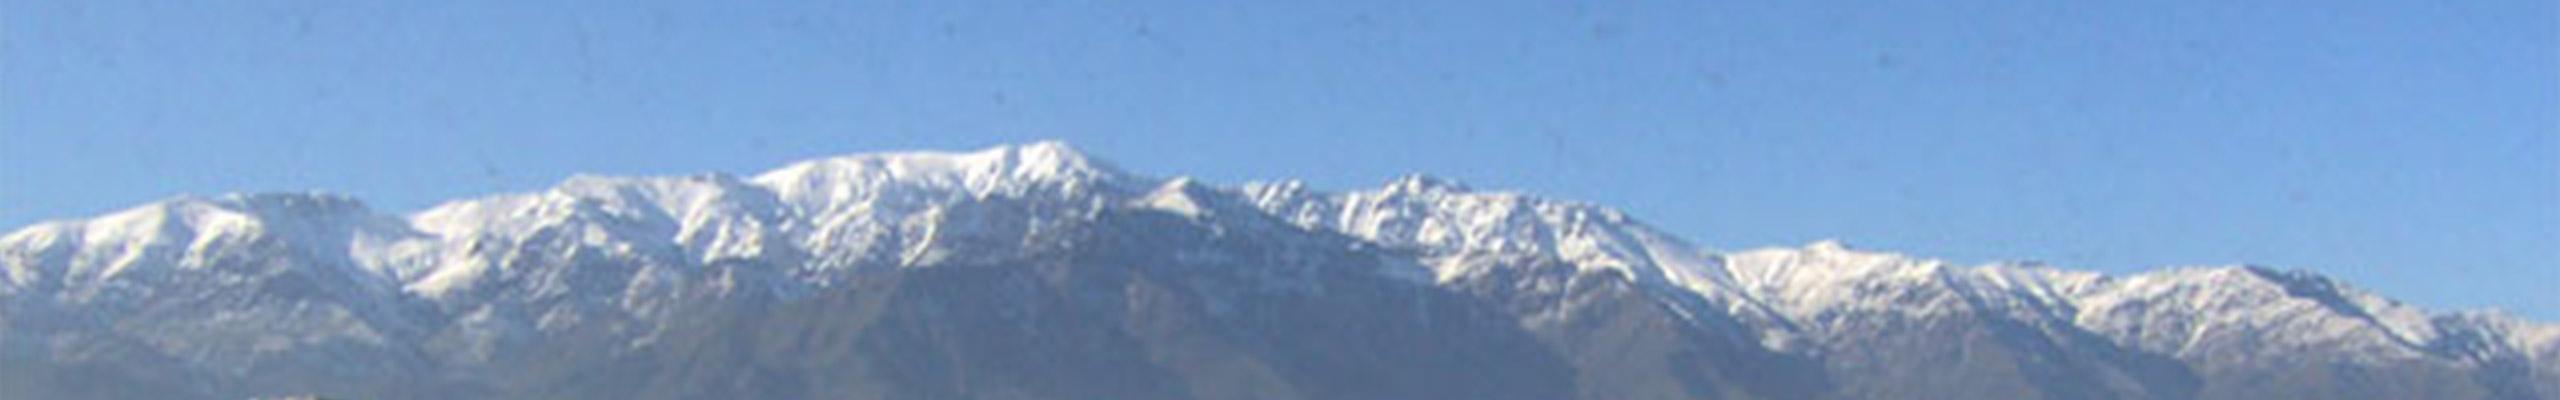 CTI Banner chile 2560 400